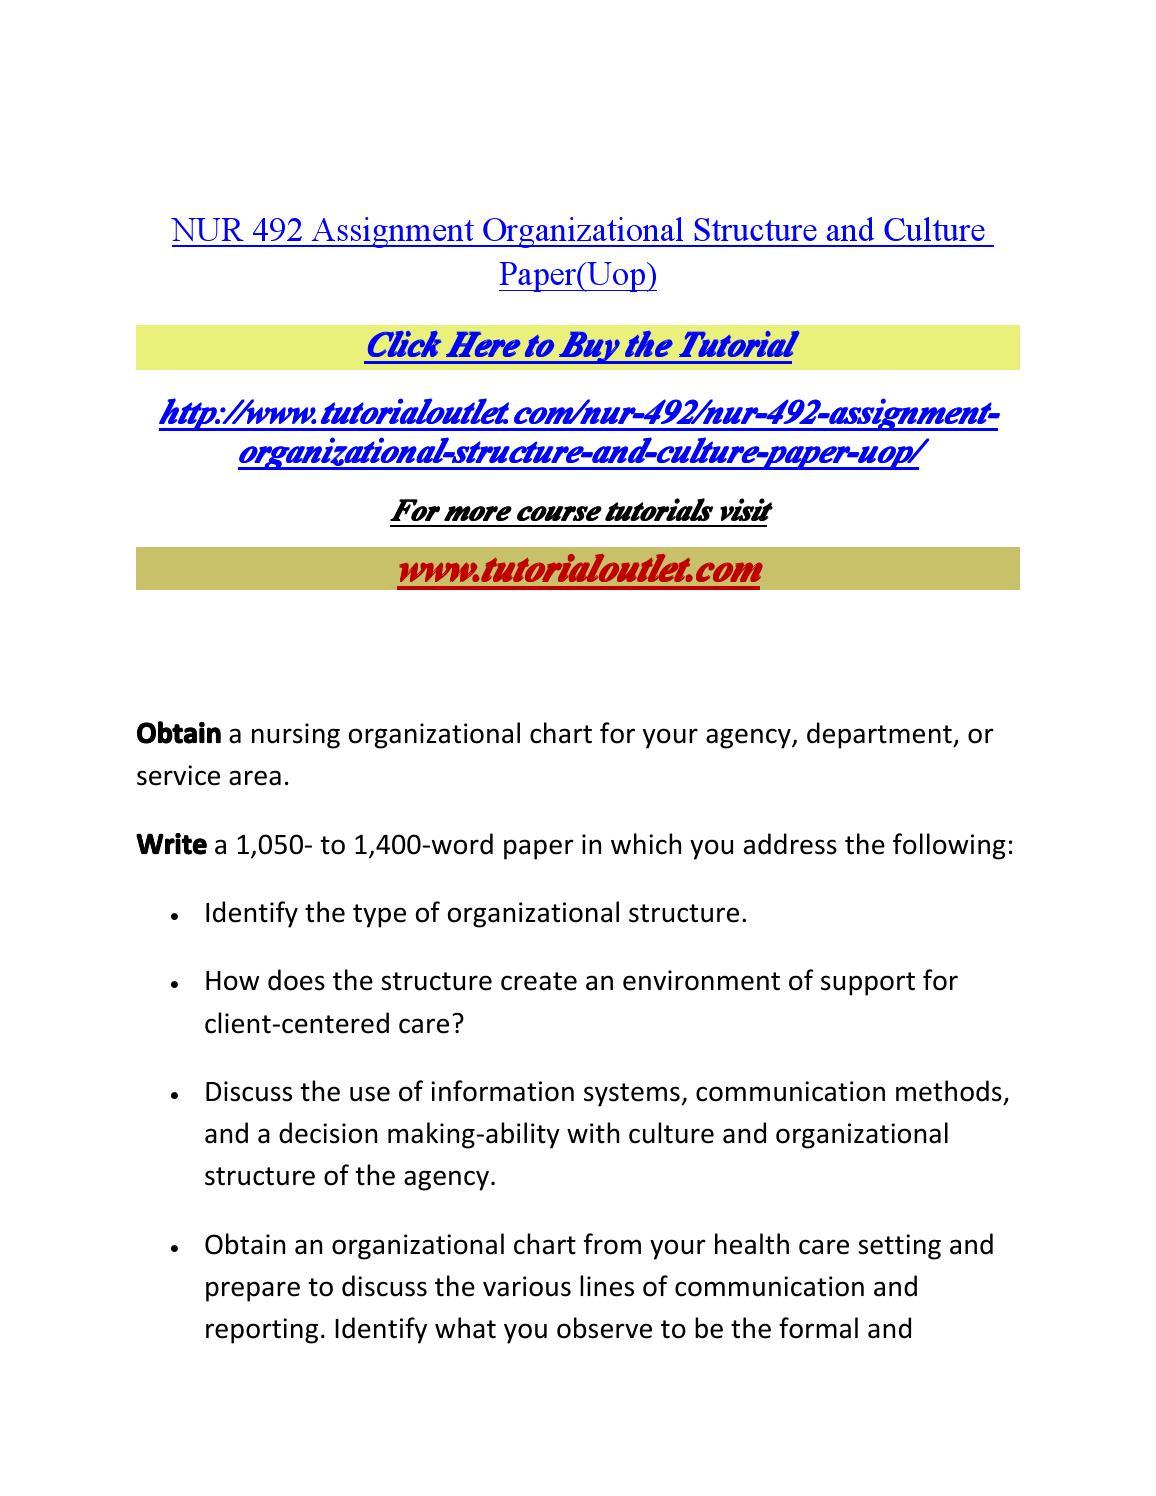 Organizational culture essay